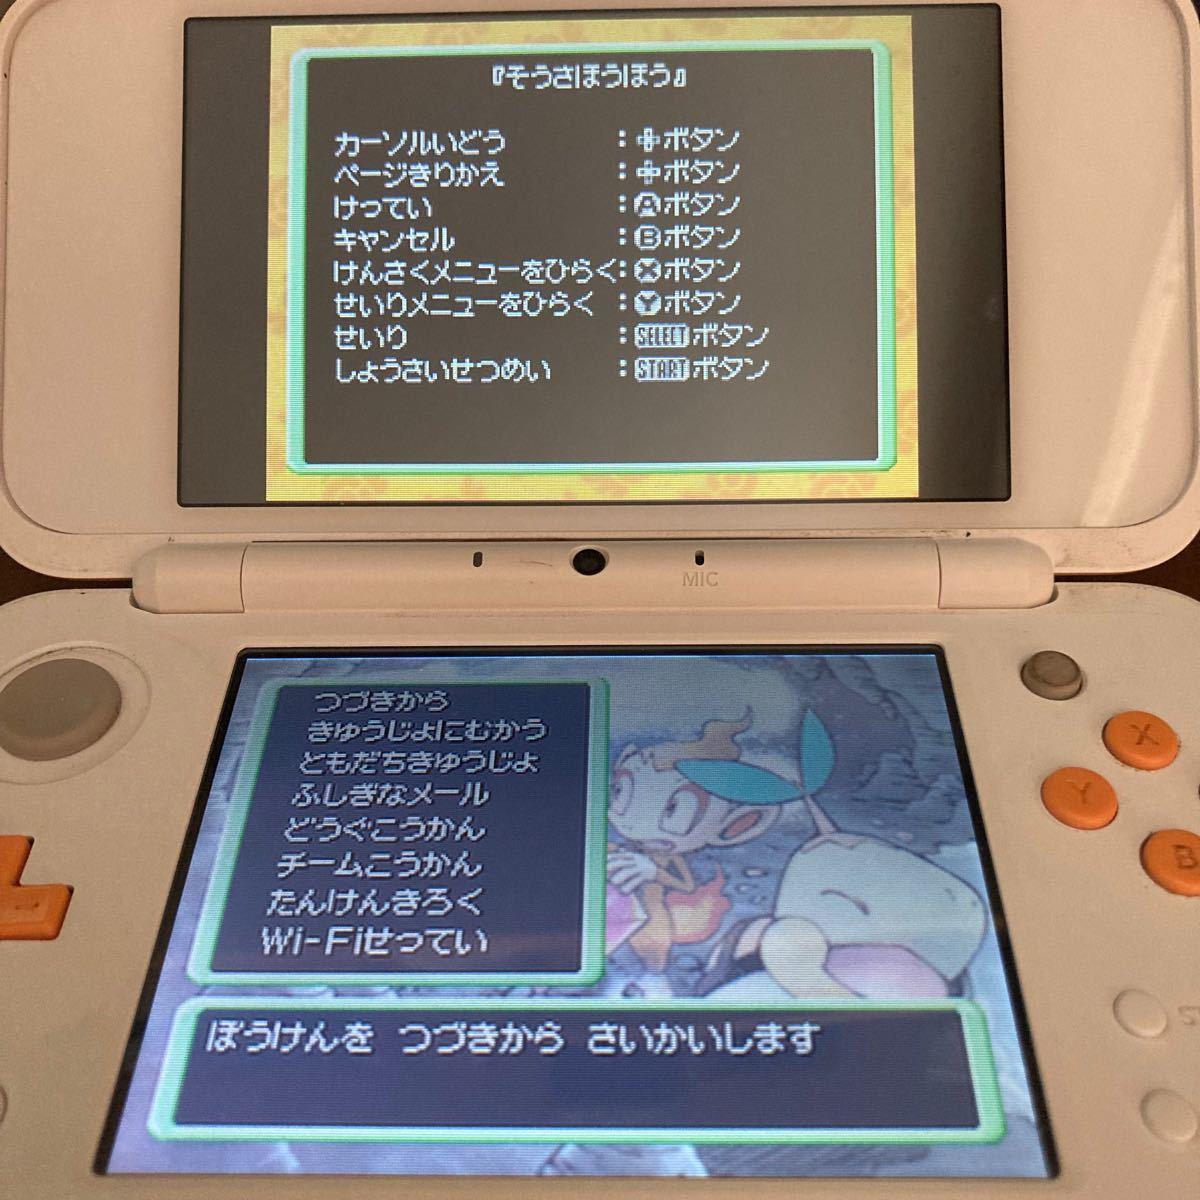 DS ポケモン不思議のダンジョン闇の探検隊  ソフトのみ